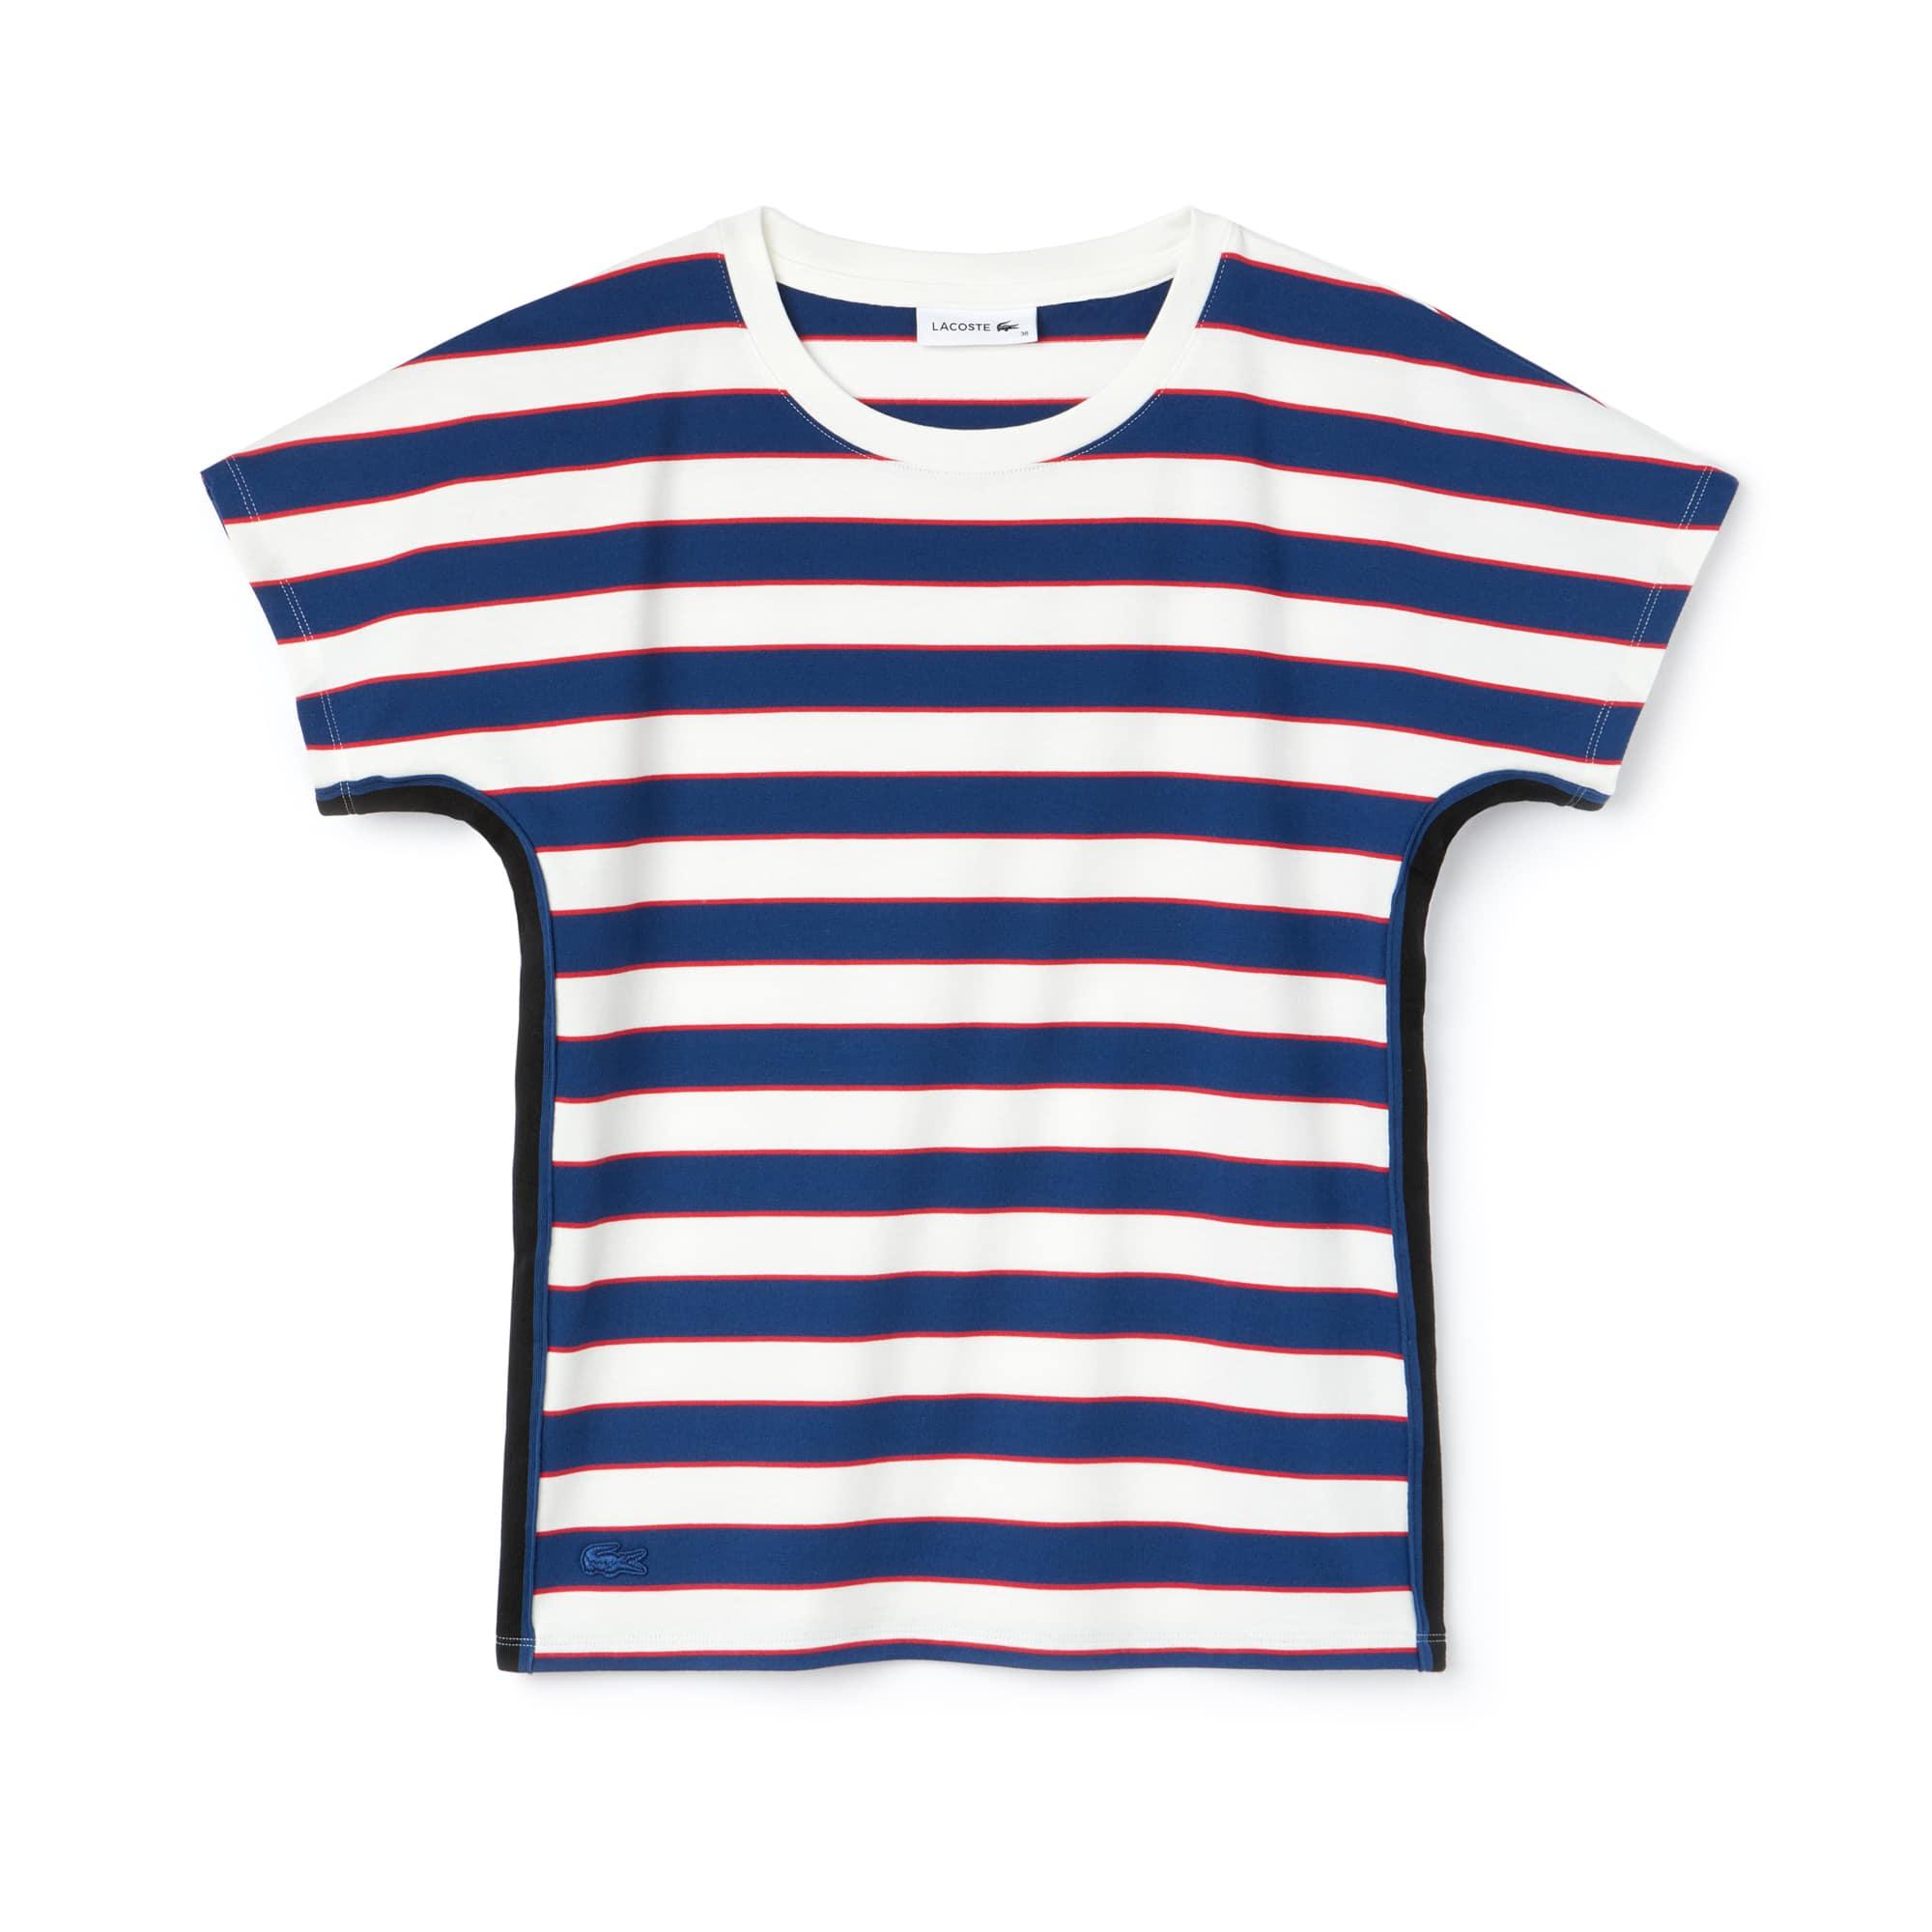 Women's Crew Neck Colorblock Striped Cotton Jersey T-shirt